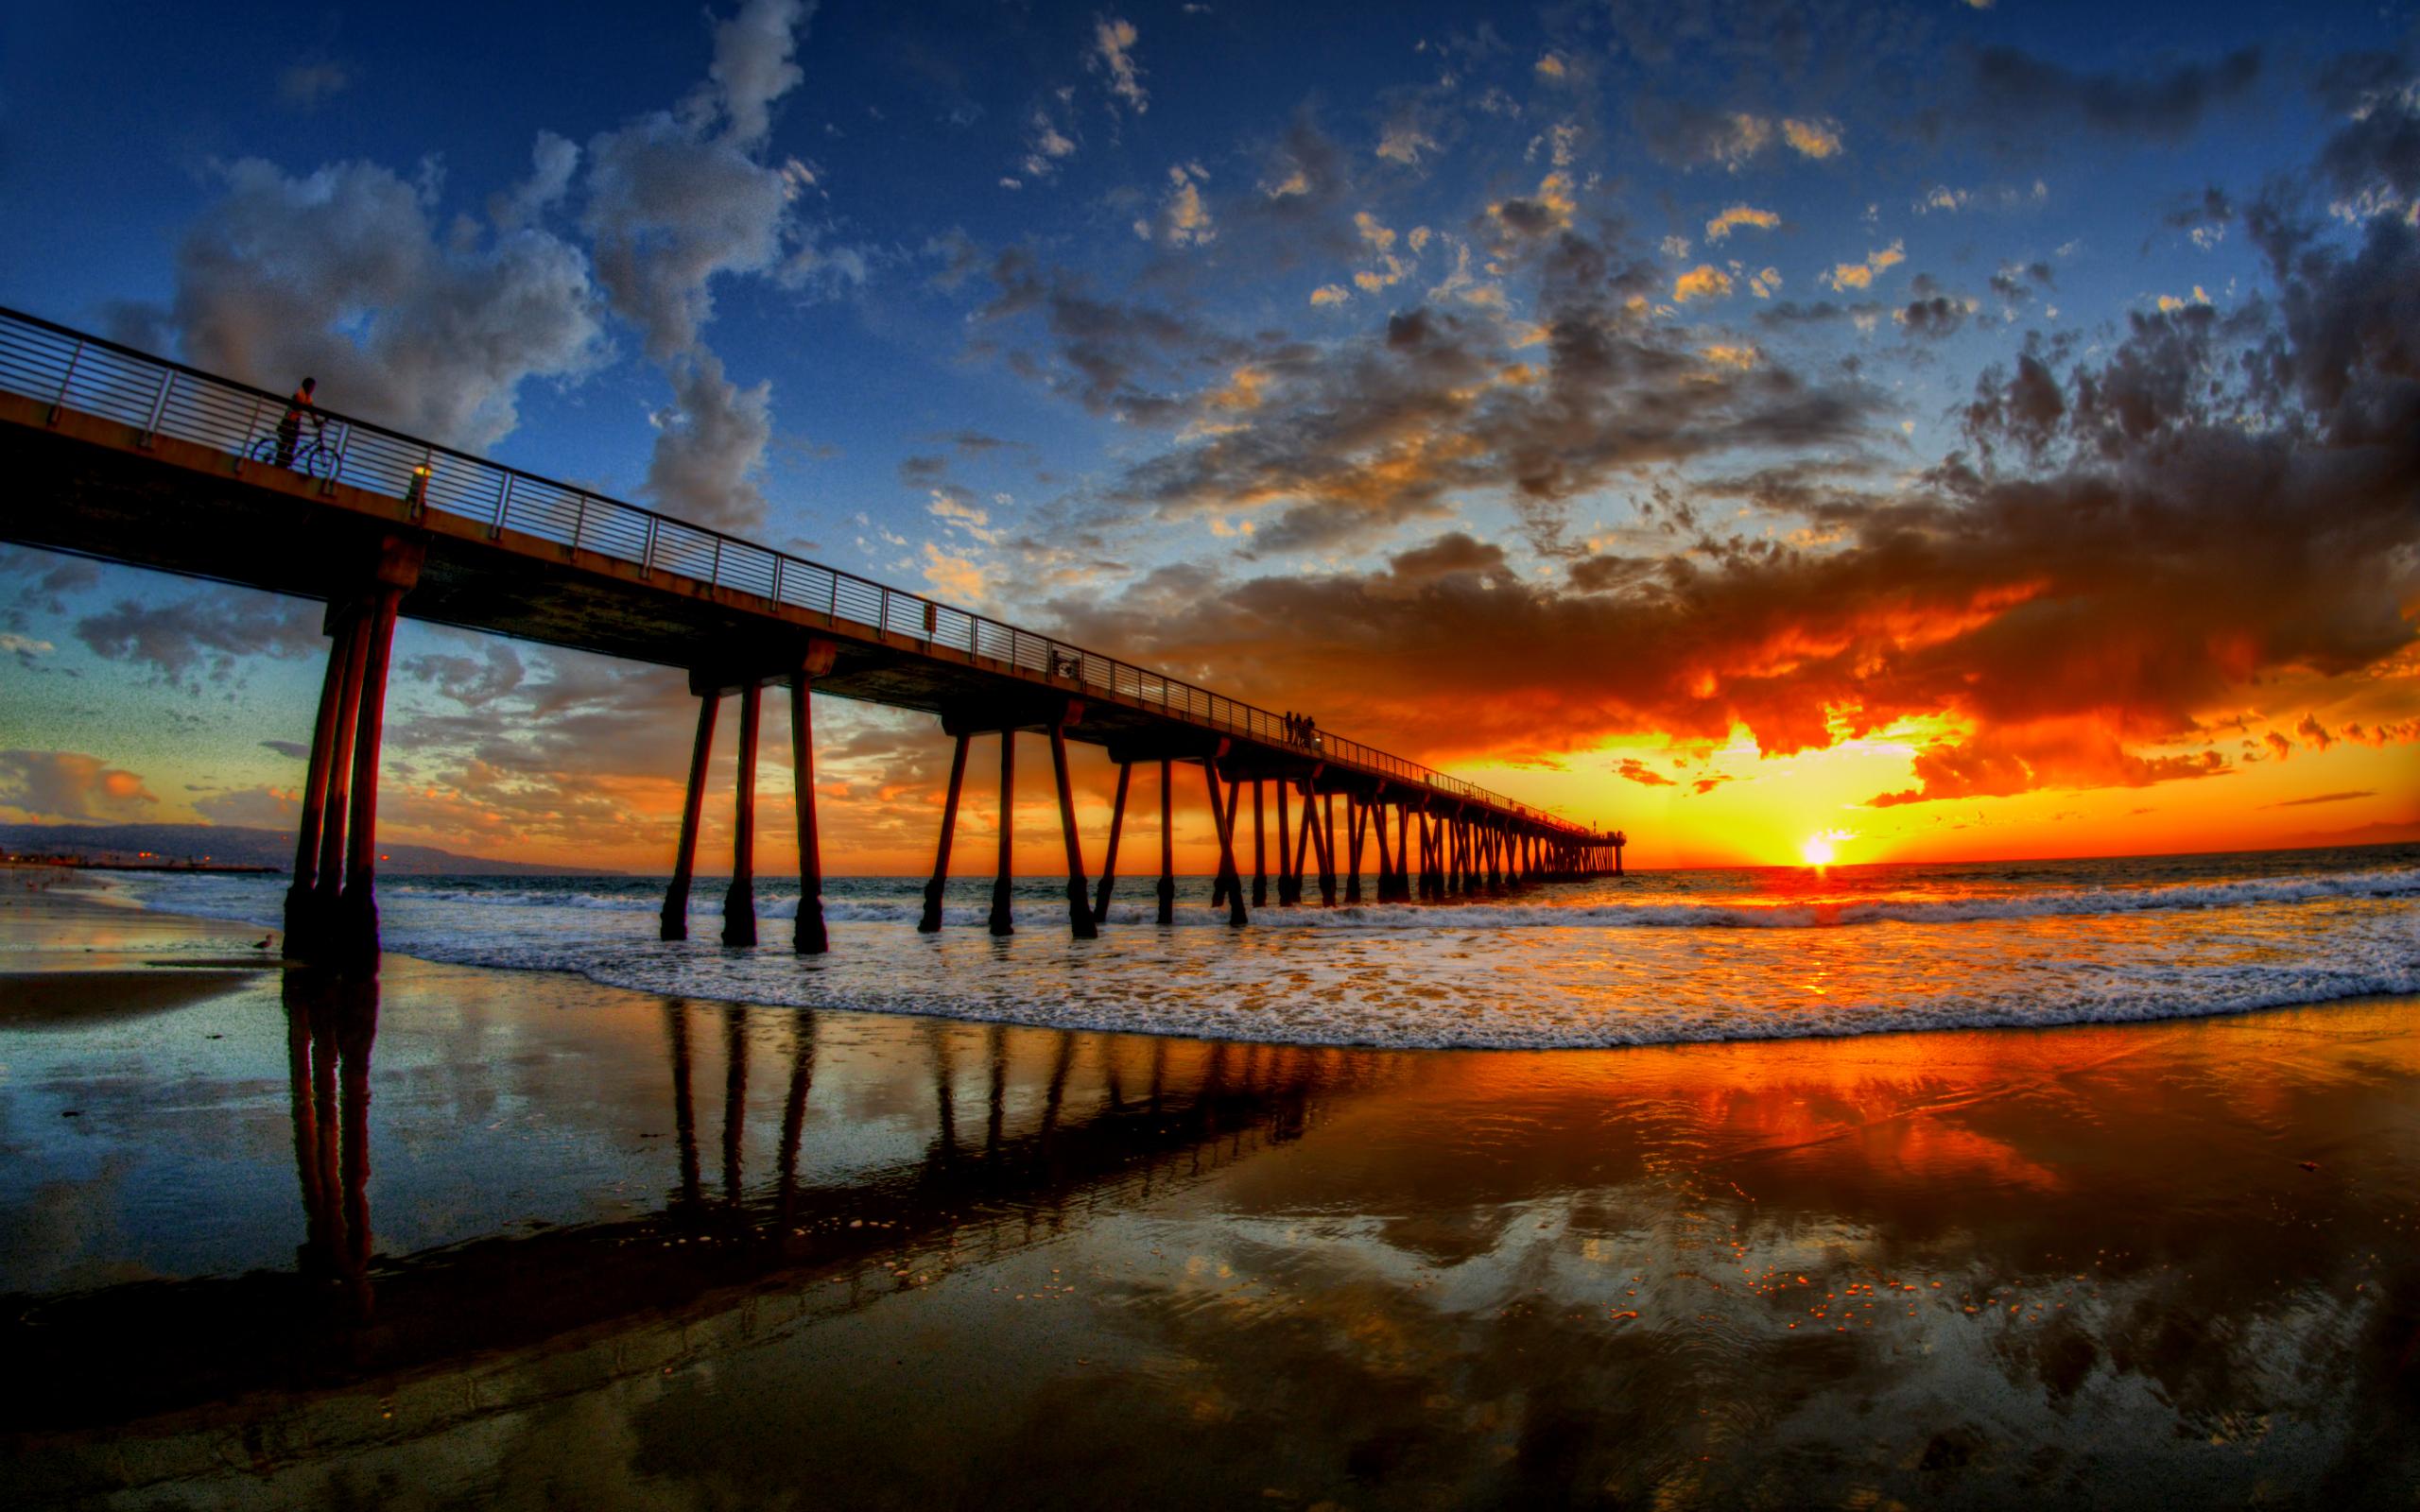 summer sunset landscape wallpaper - photo #18